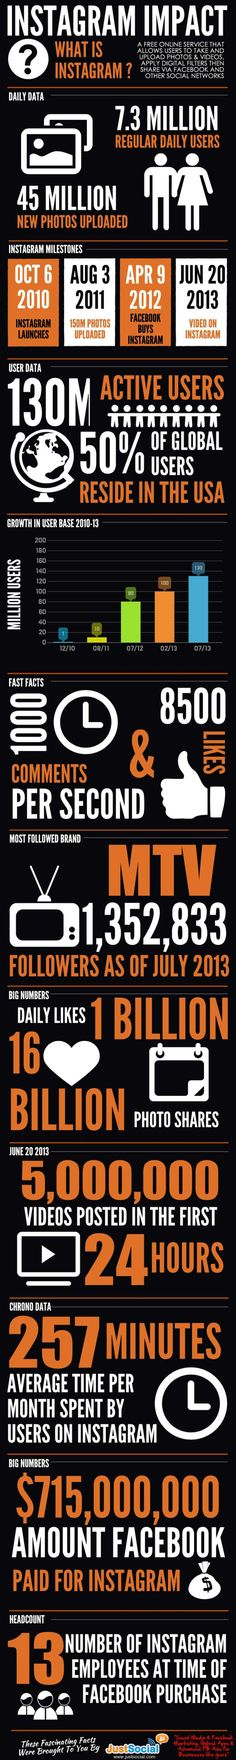 Instagram impact #infografia #infographic socialmedia